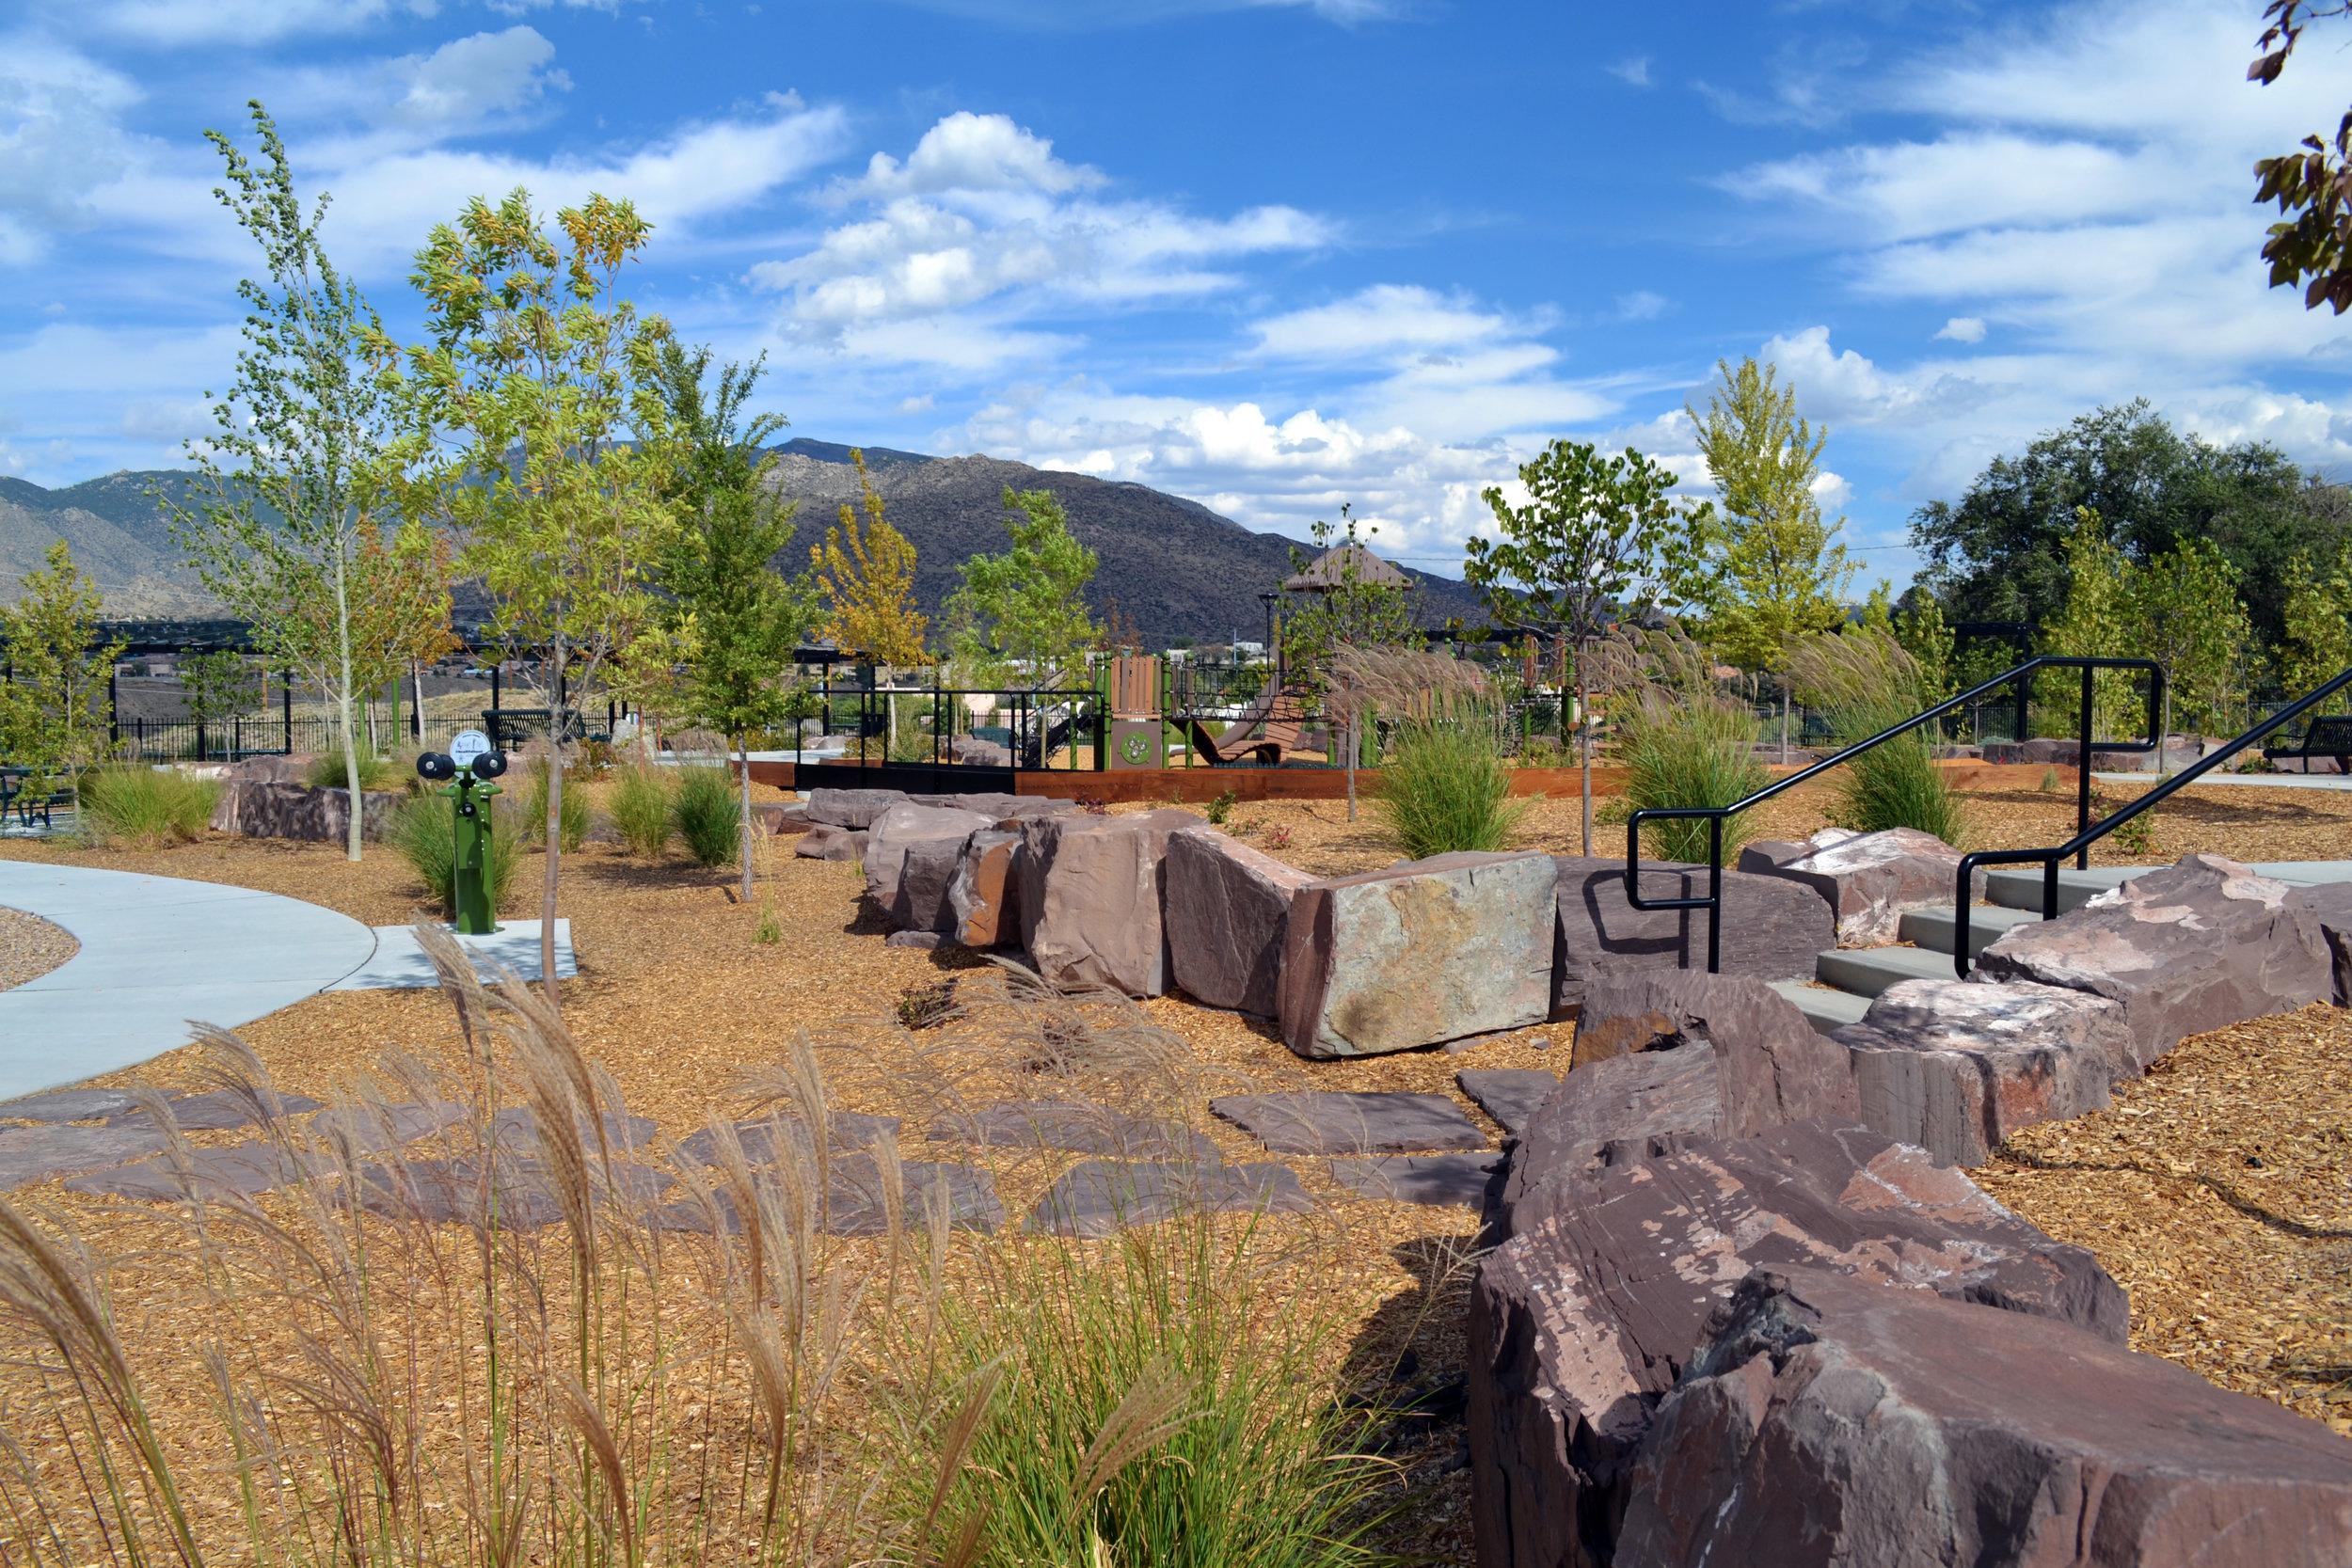 4 Four Hills Village Park, Albuquerque NM -  natural stone features - and no turf!